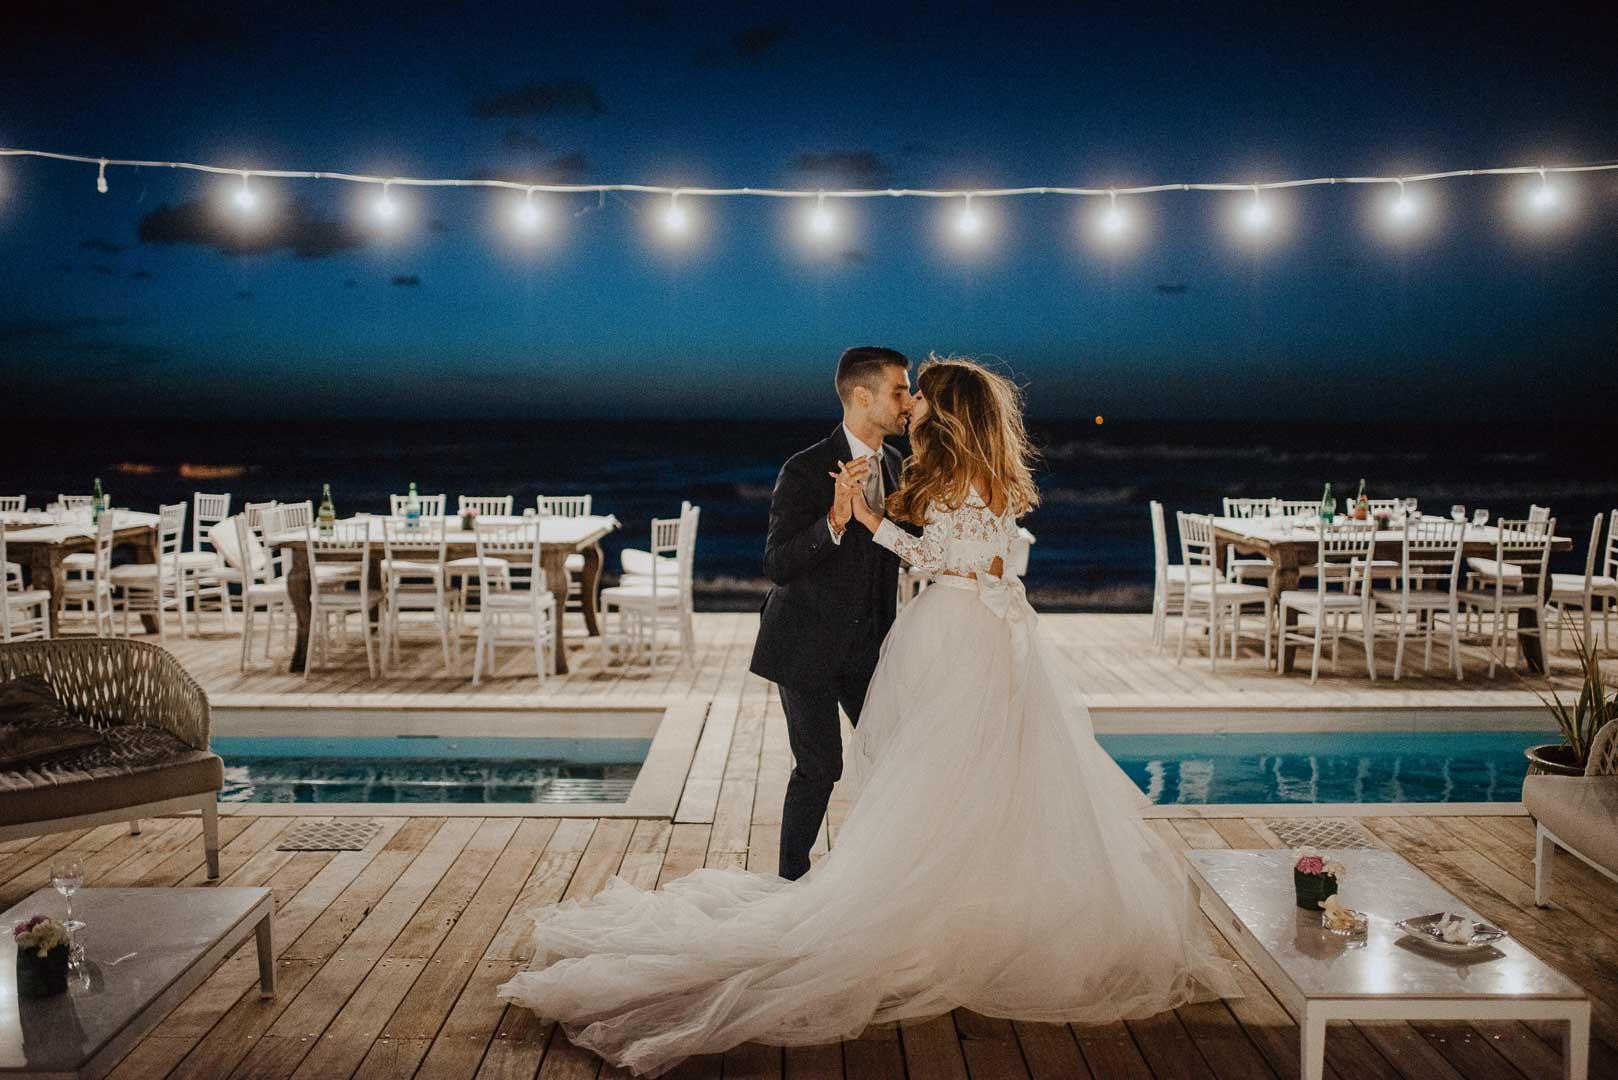 wedding-photographer-destination-fineart-bespoke-reportage-napoli-nabilah-vivianeizzo-spazio46-167